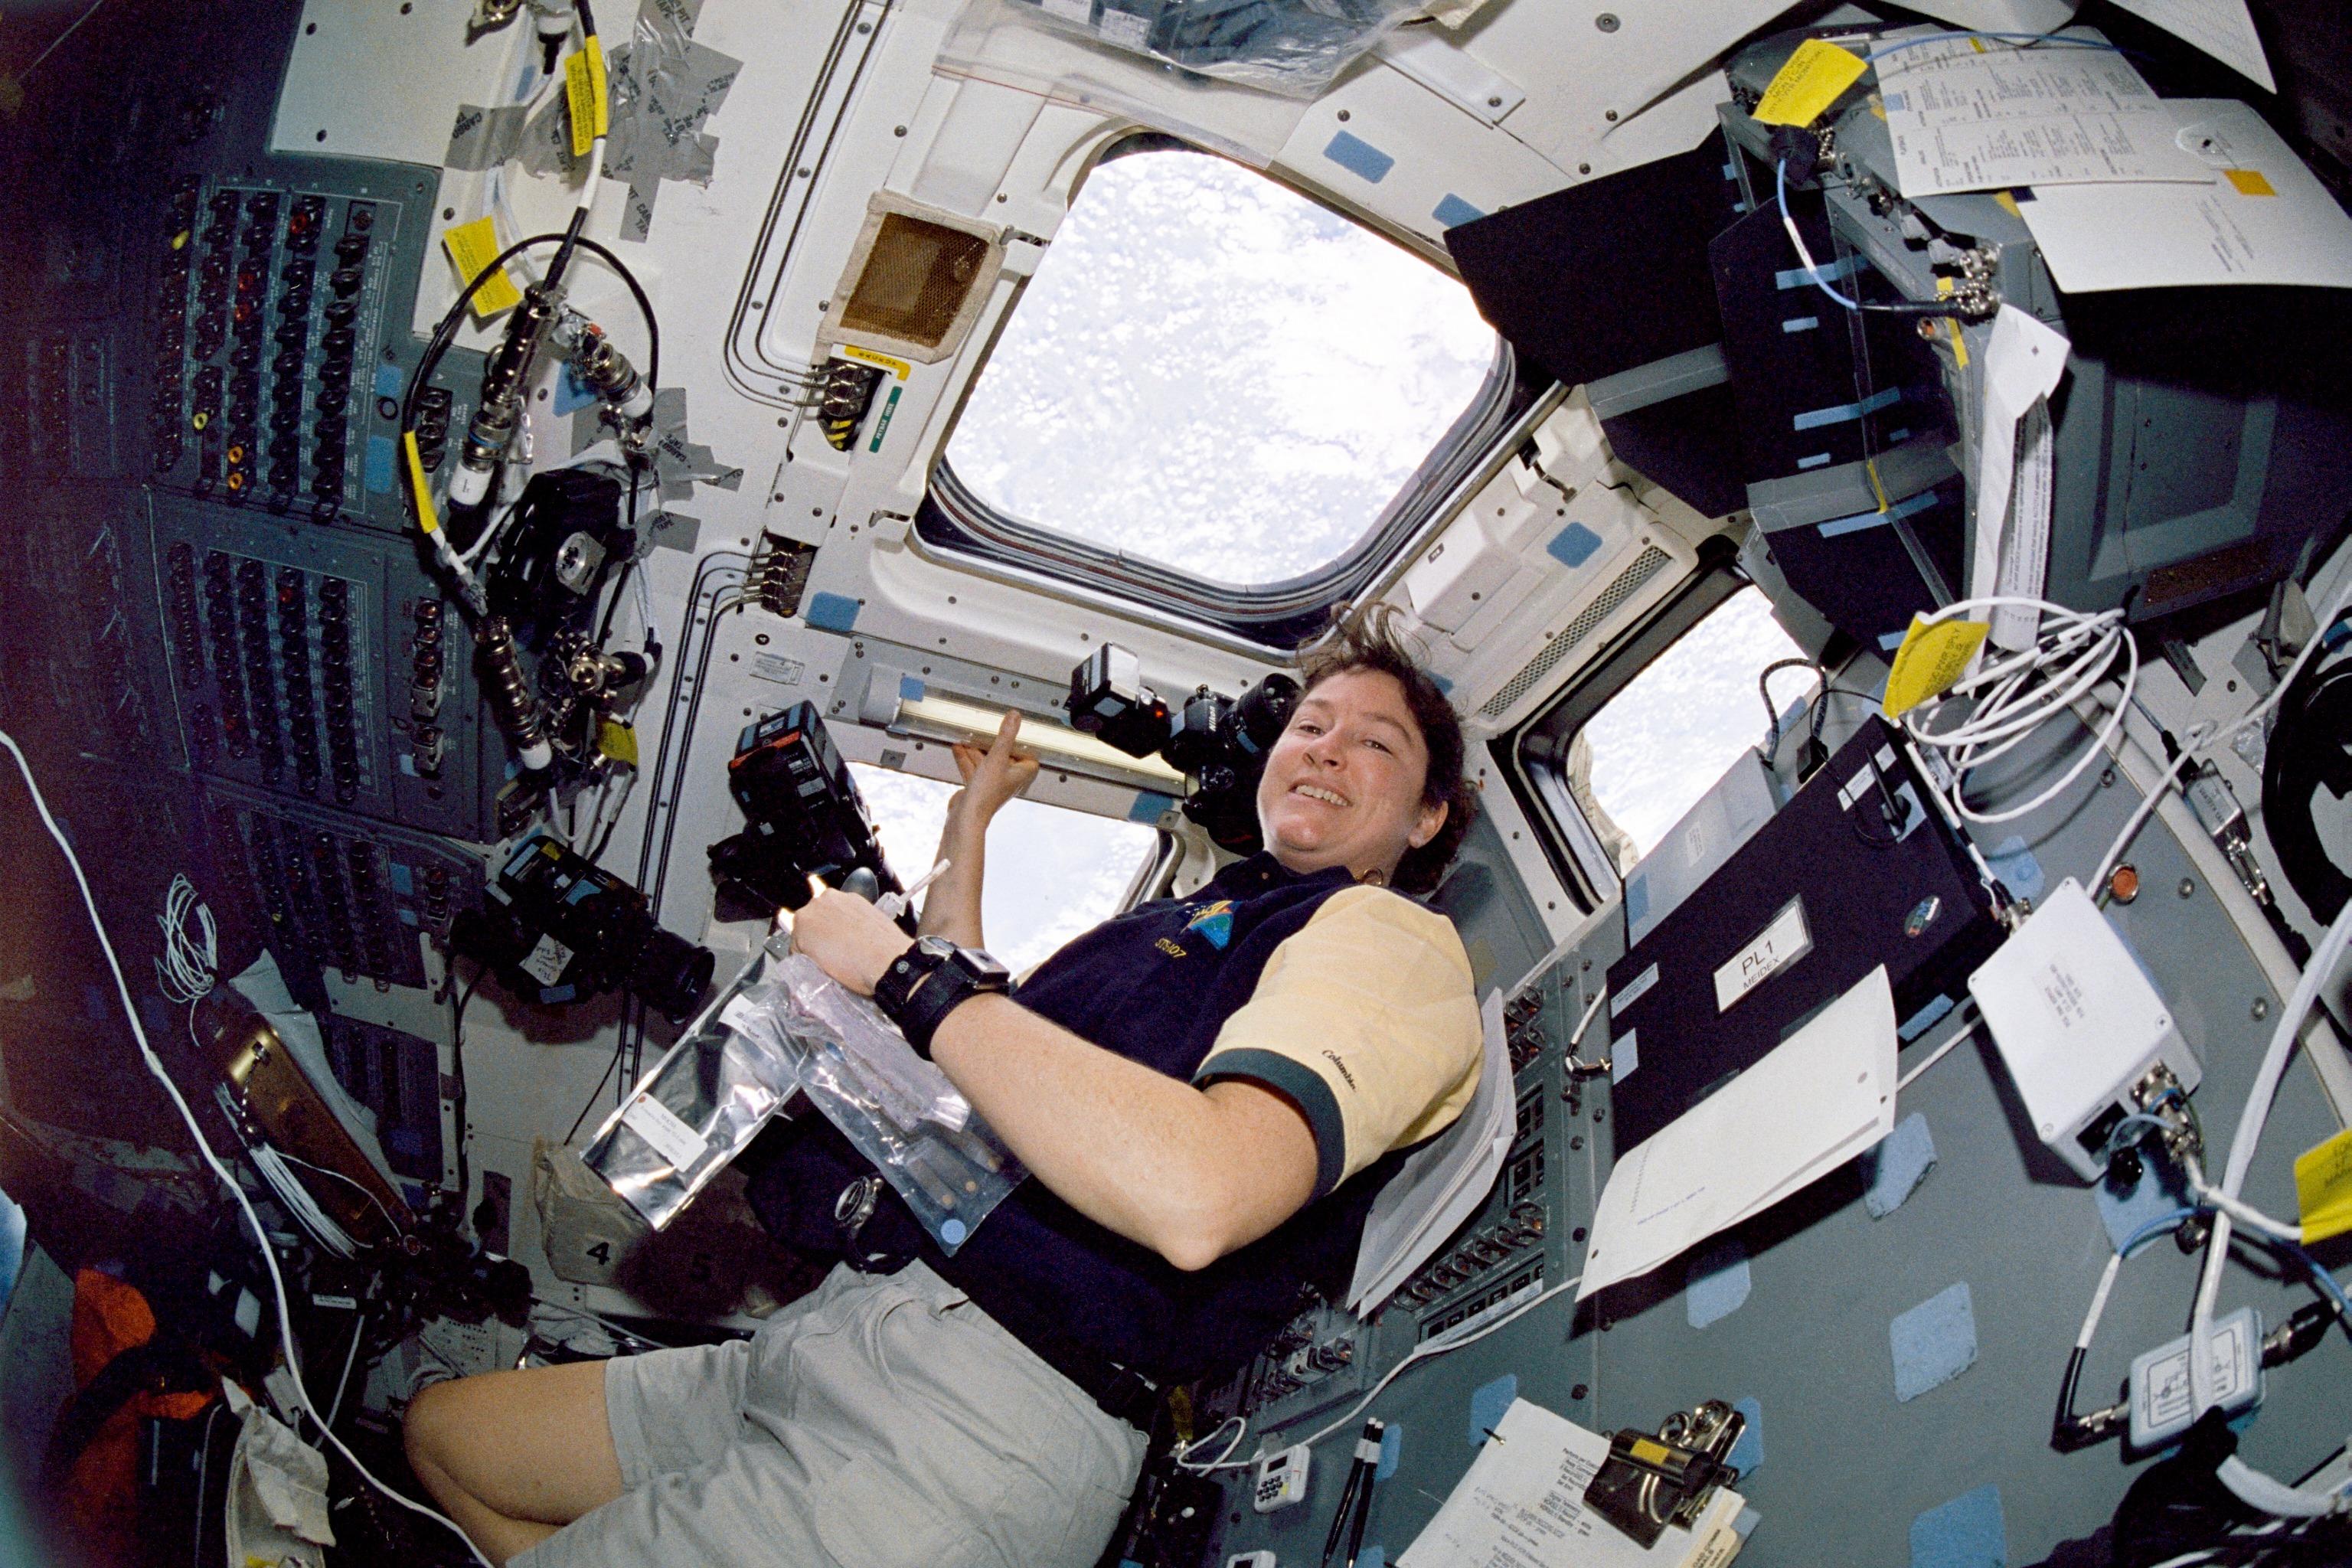 Astronaut Laurel Clark, STS-107 Mission Specialist